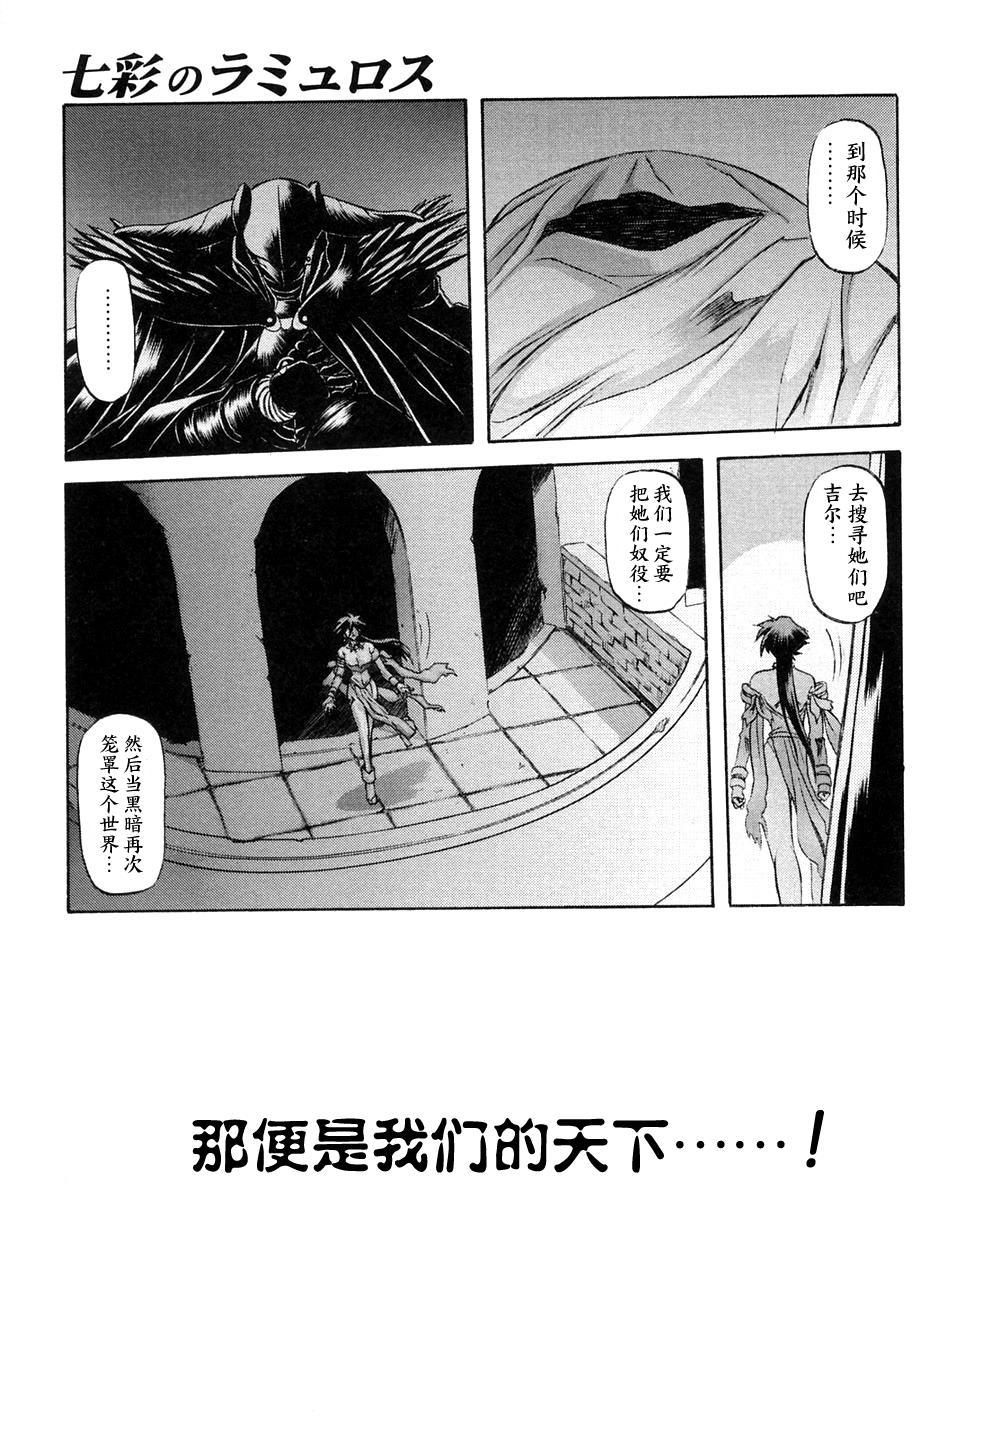 [Sanbun Kyoden] Shichisai no Lamuros | The Lamuros of Seven Colors [Chinese] ep.1 15